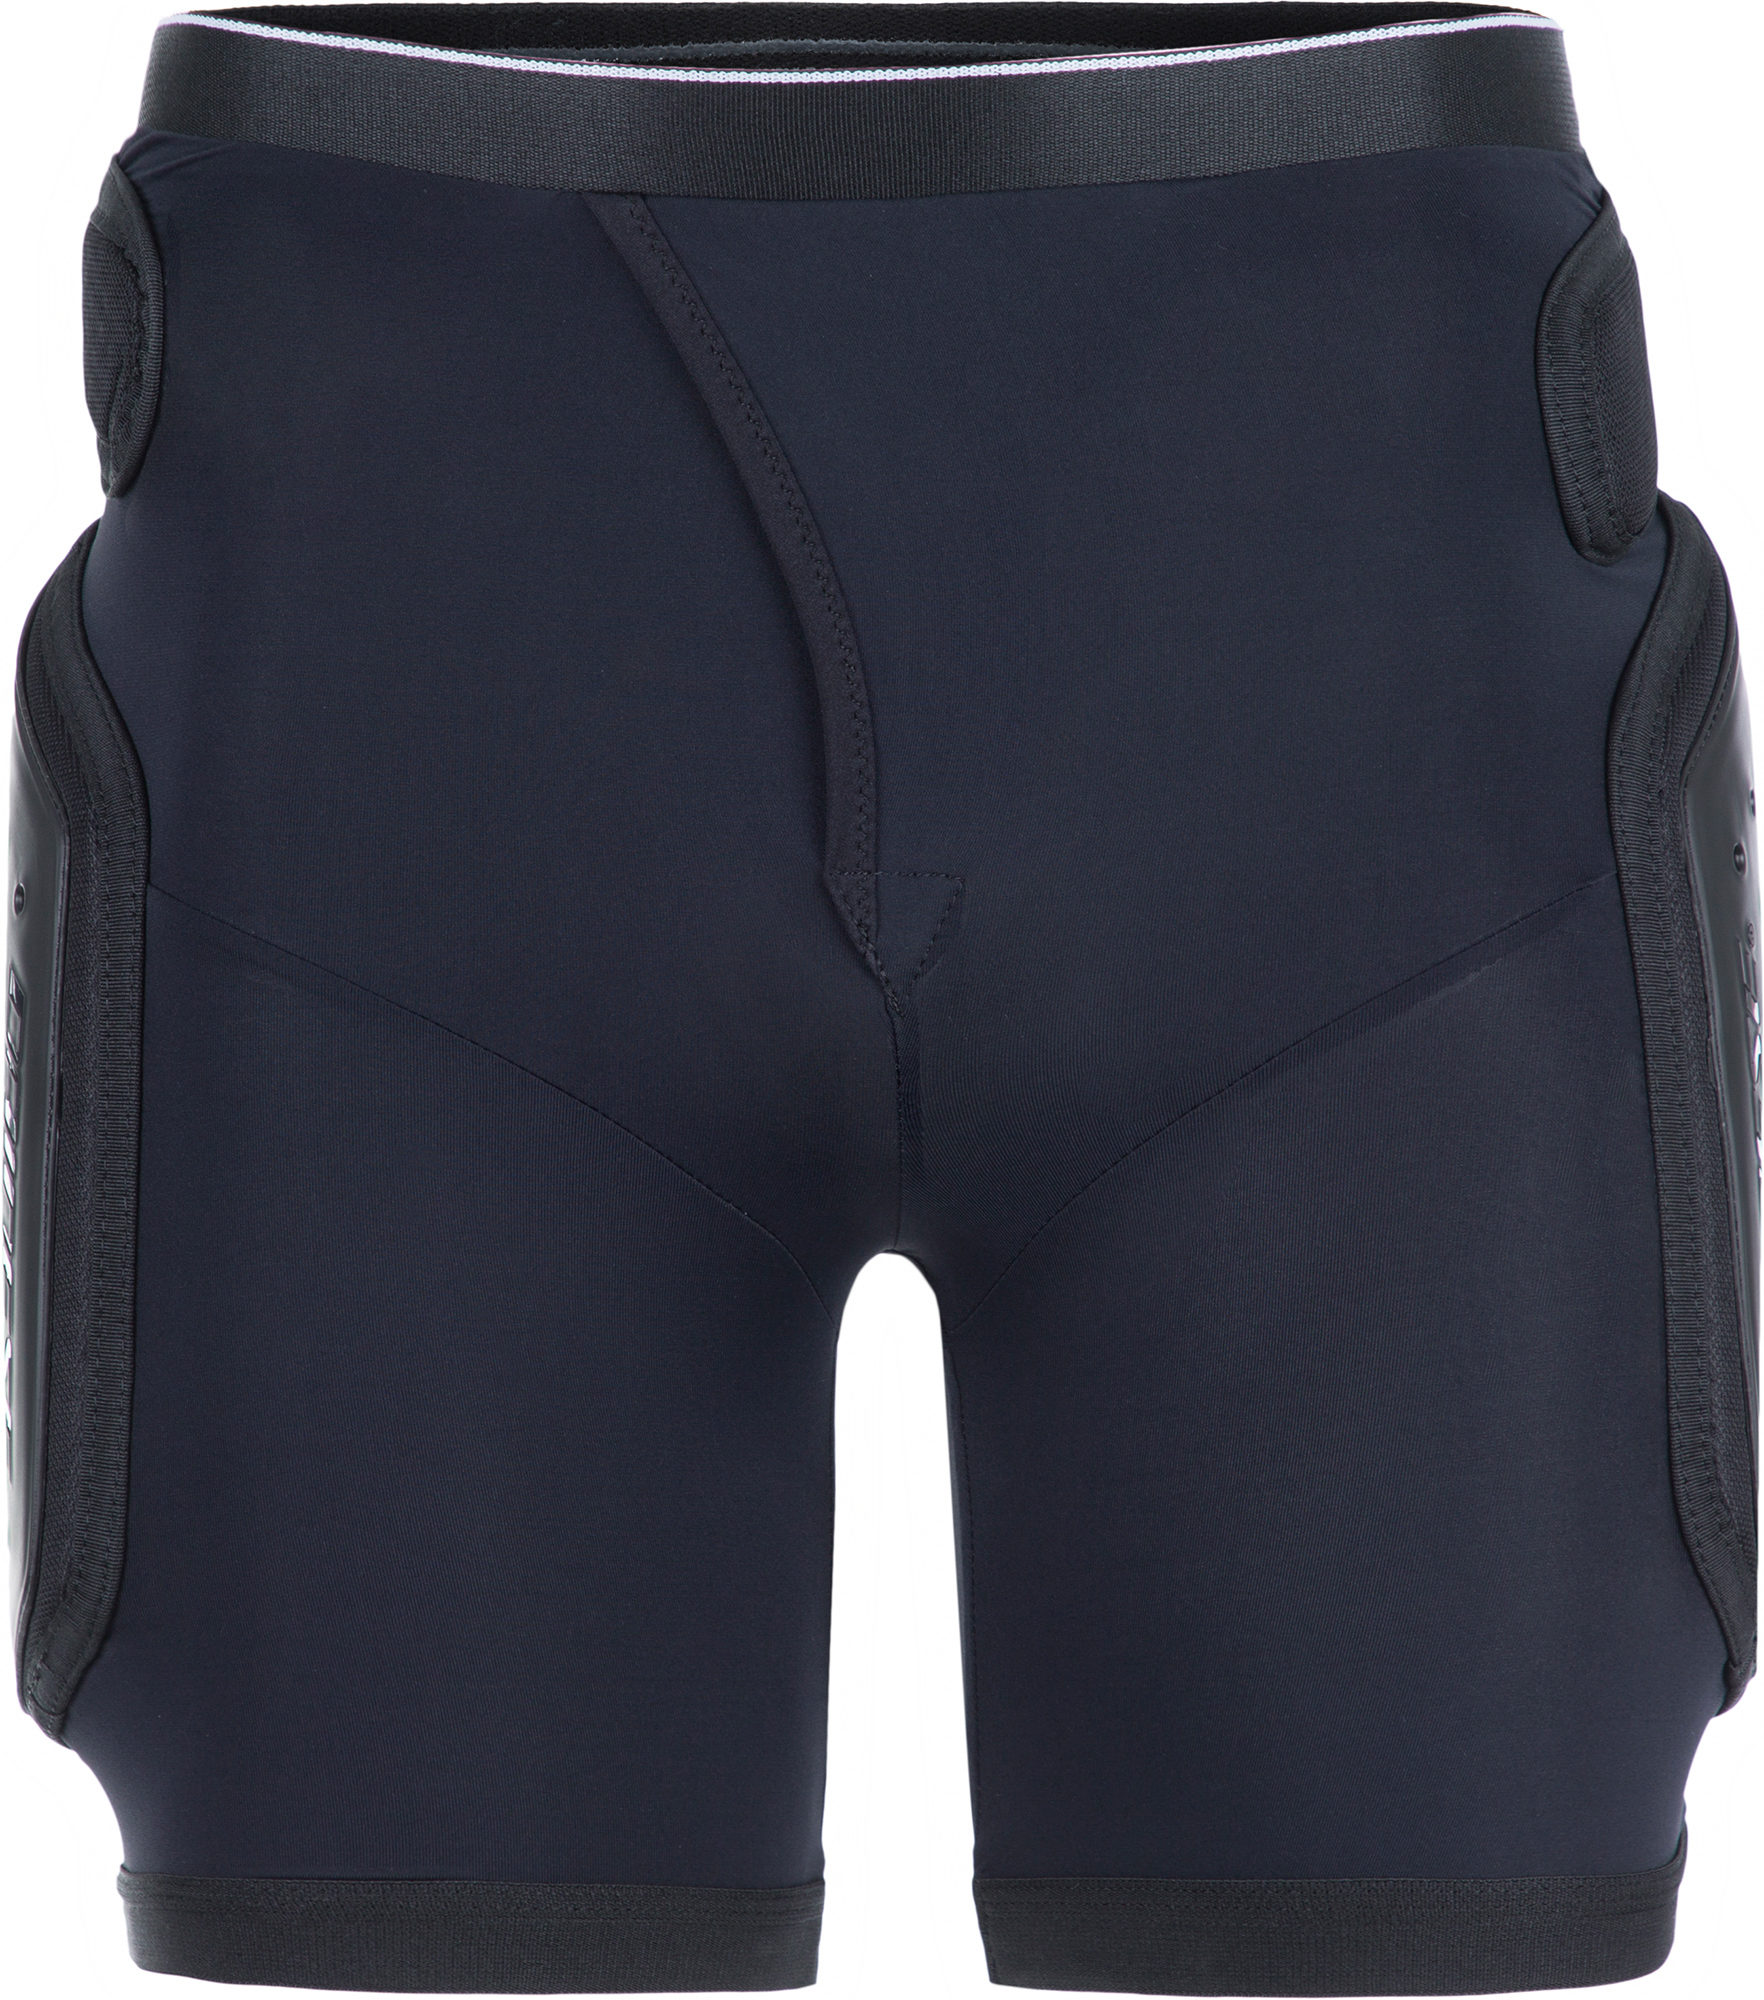 Dainese Шорты защитные Action Shorts Evo